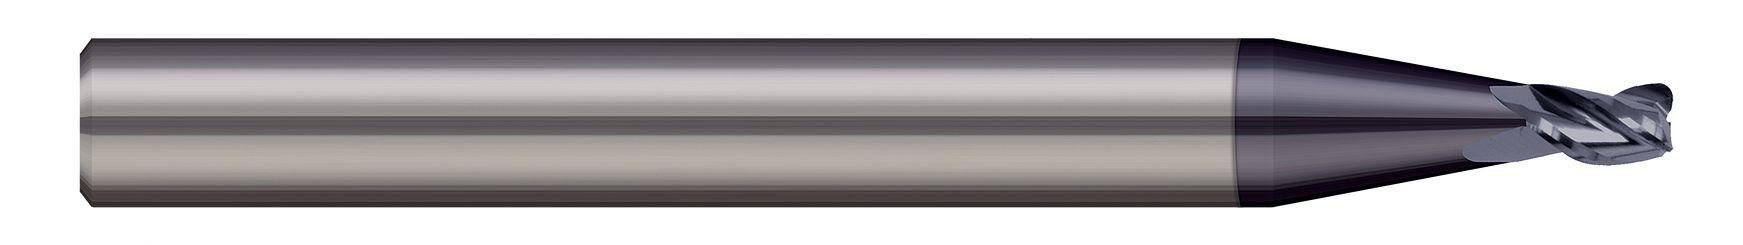 End Mills for Steels & High Temperature Alloys - Corner Radius - 2 & 3 Flute - Stub Flute